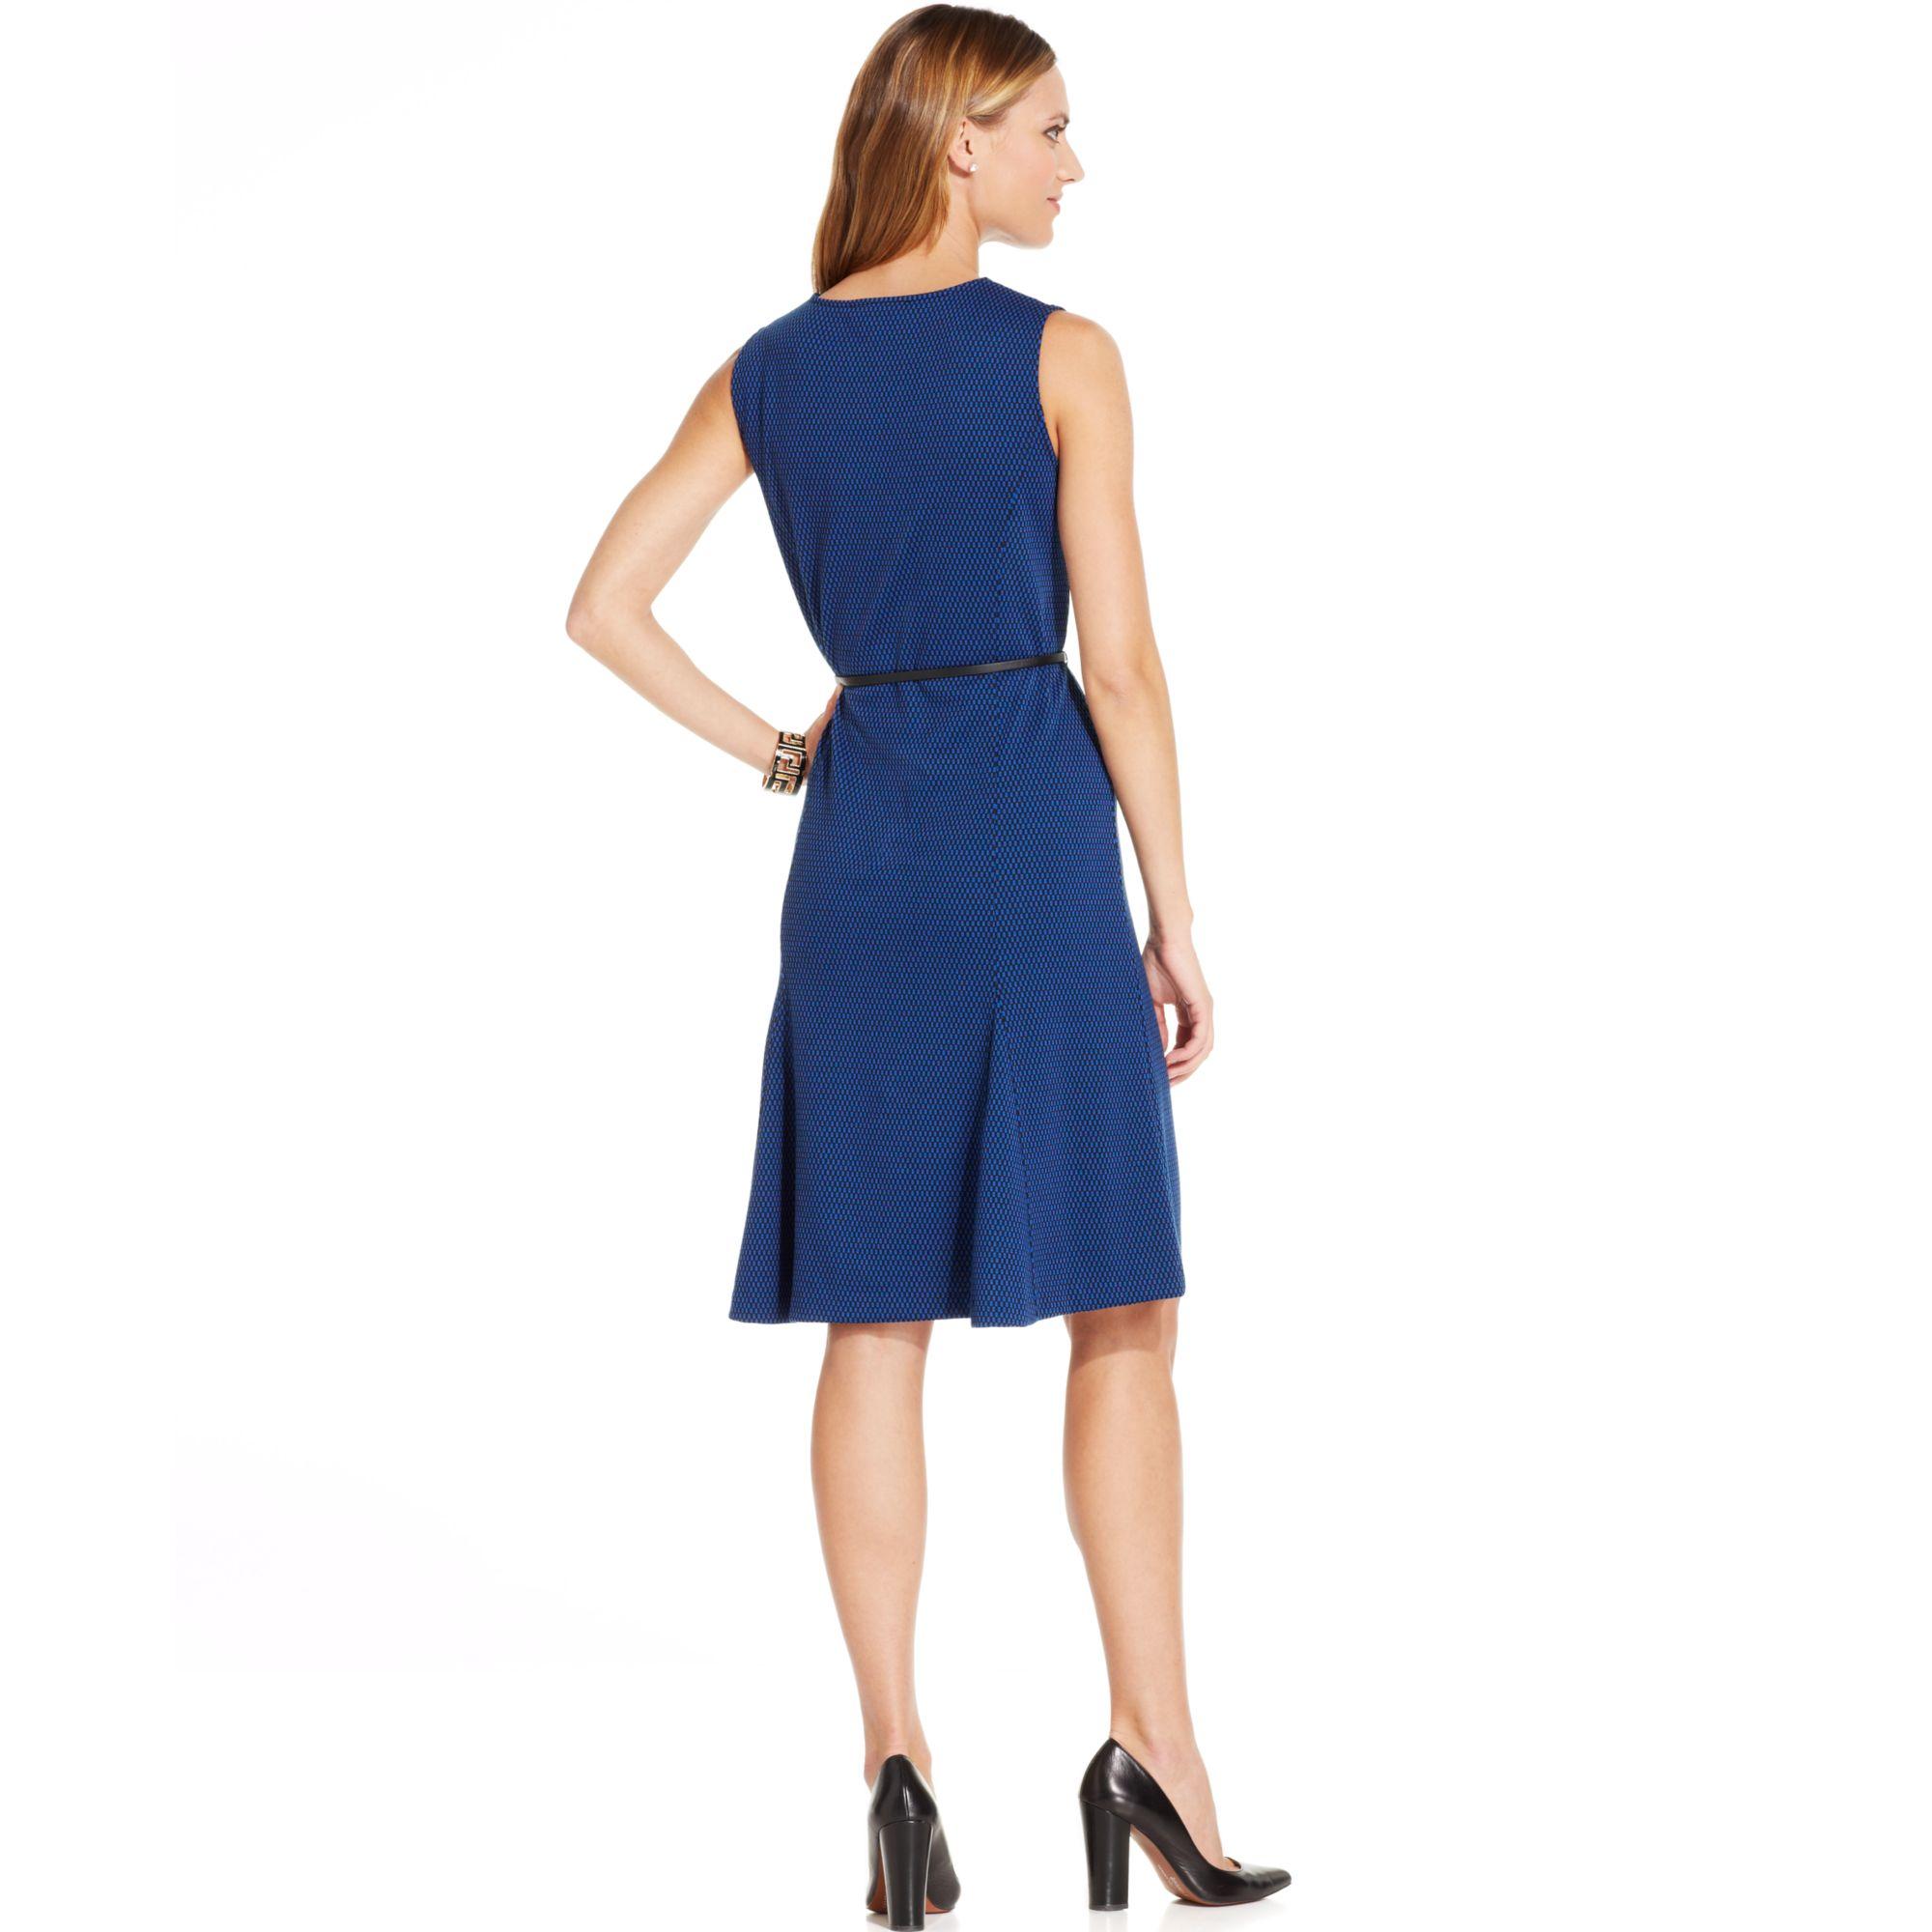 Jones New York Sleeveless Printed Belted Fit Flare Dress